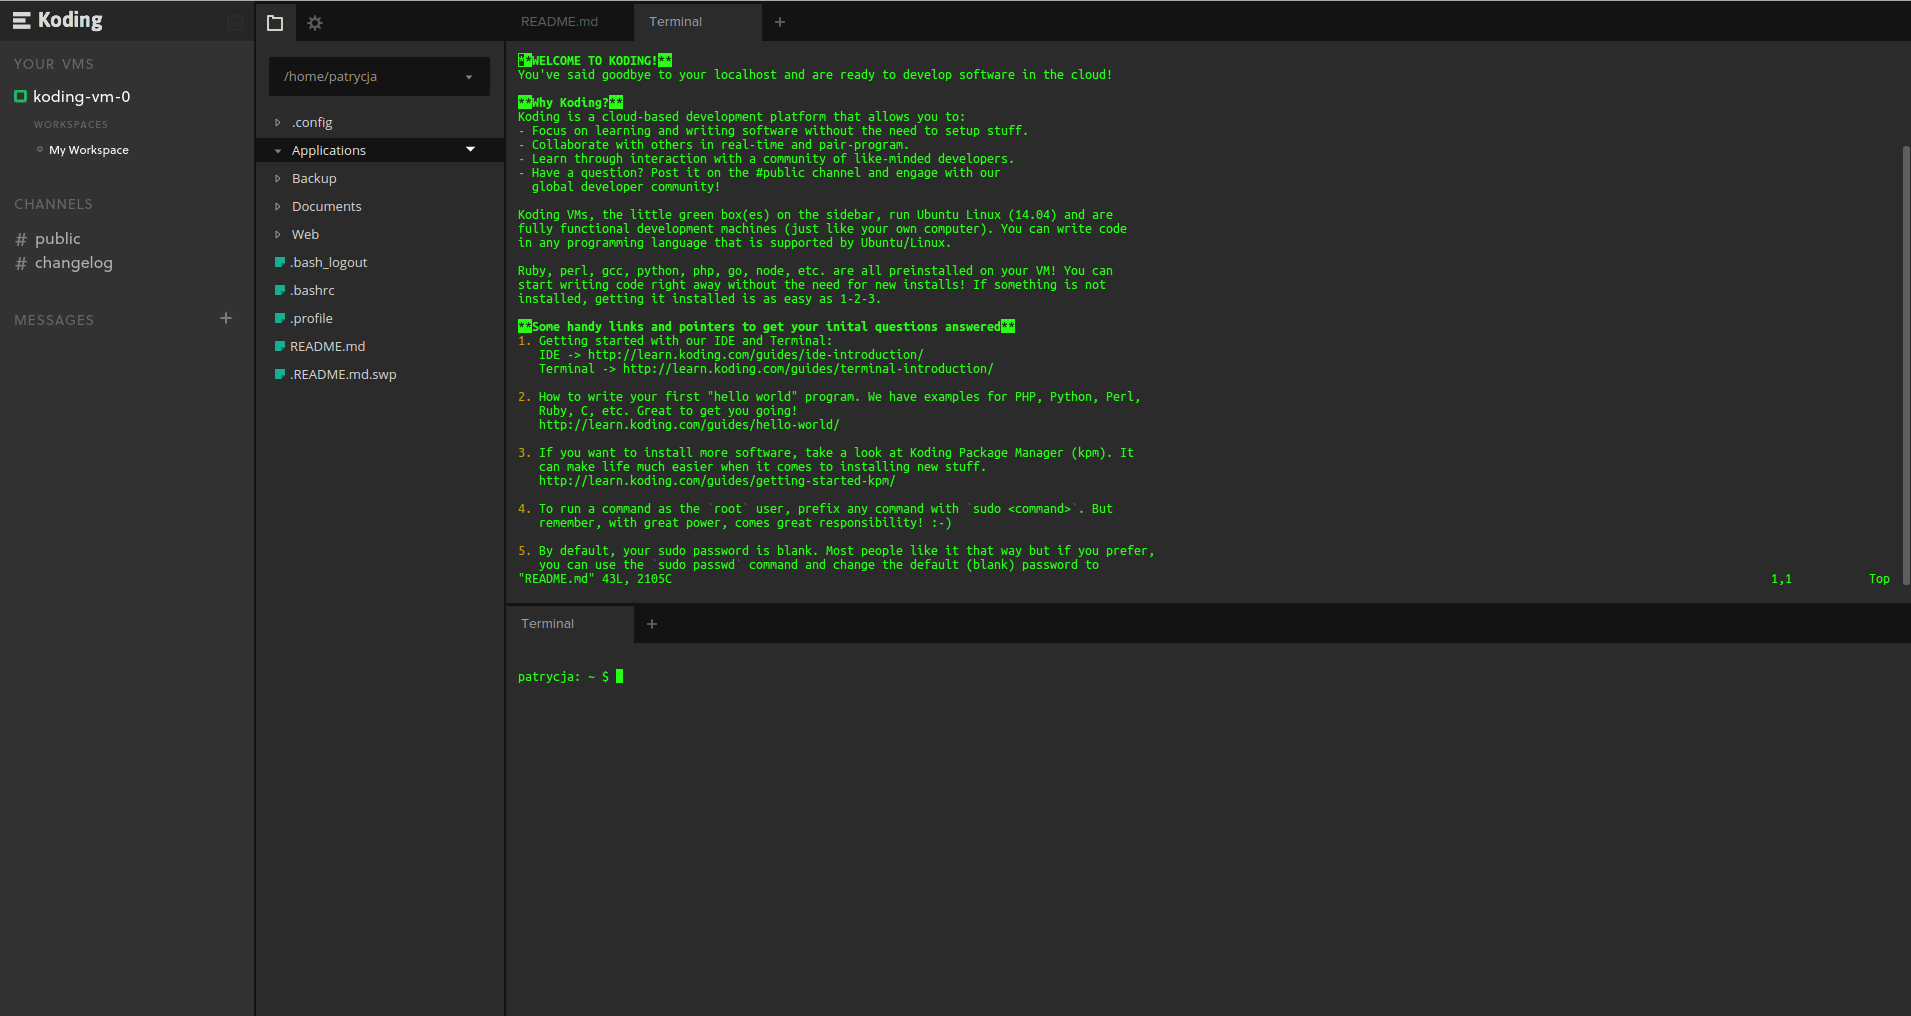 19 Useful Cloud-based Web Development Tools - DZone Cloud